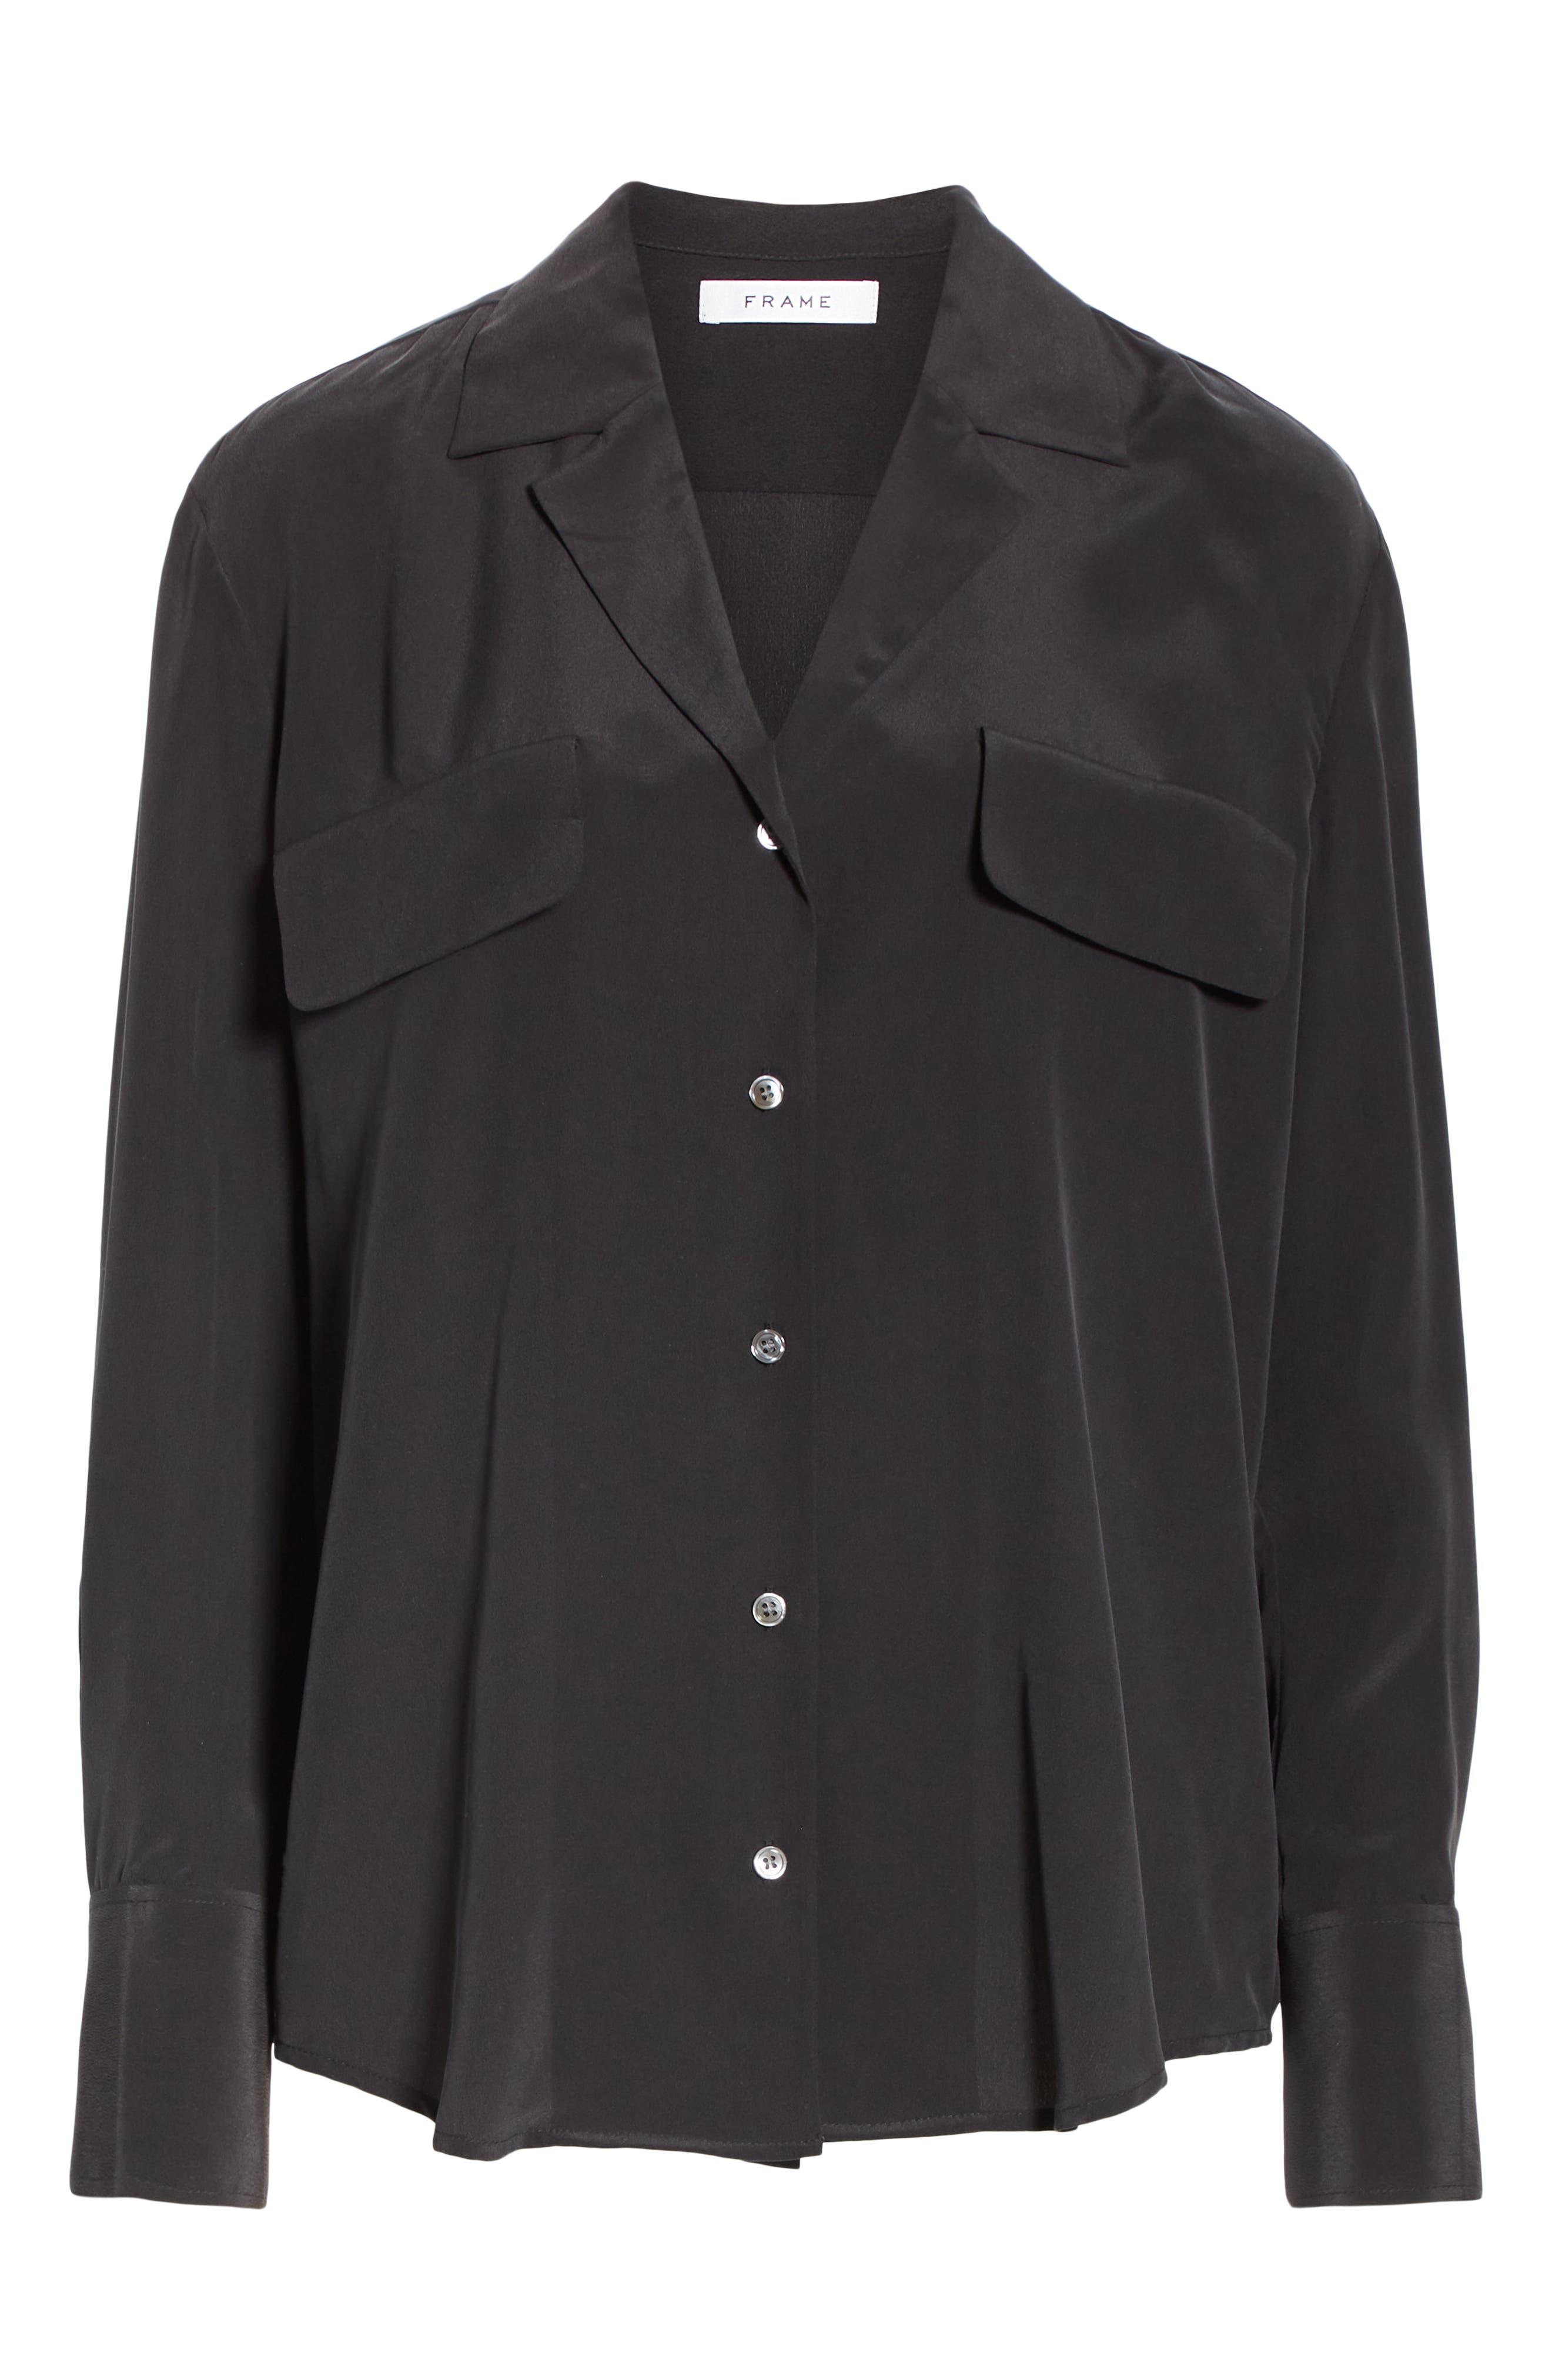 FRAME, Pocket Silk Blouse, Alternate thumbnail 6, color, BLACK